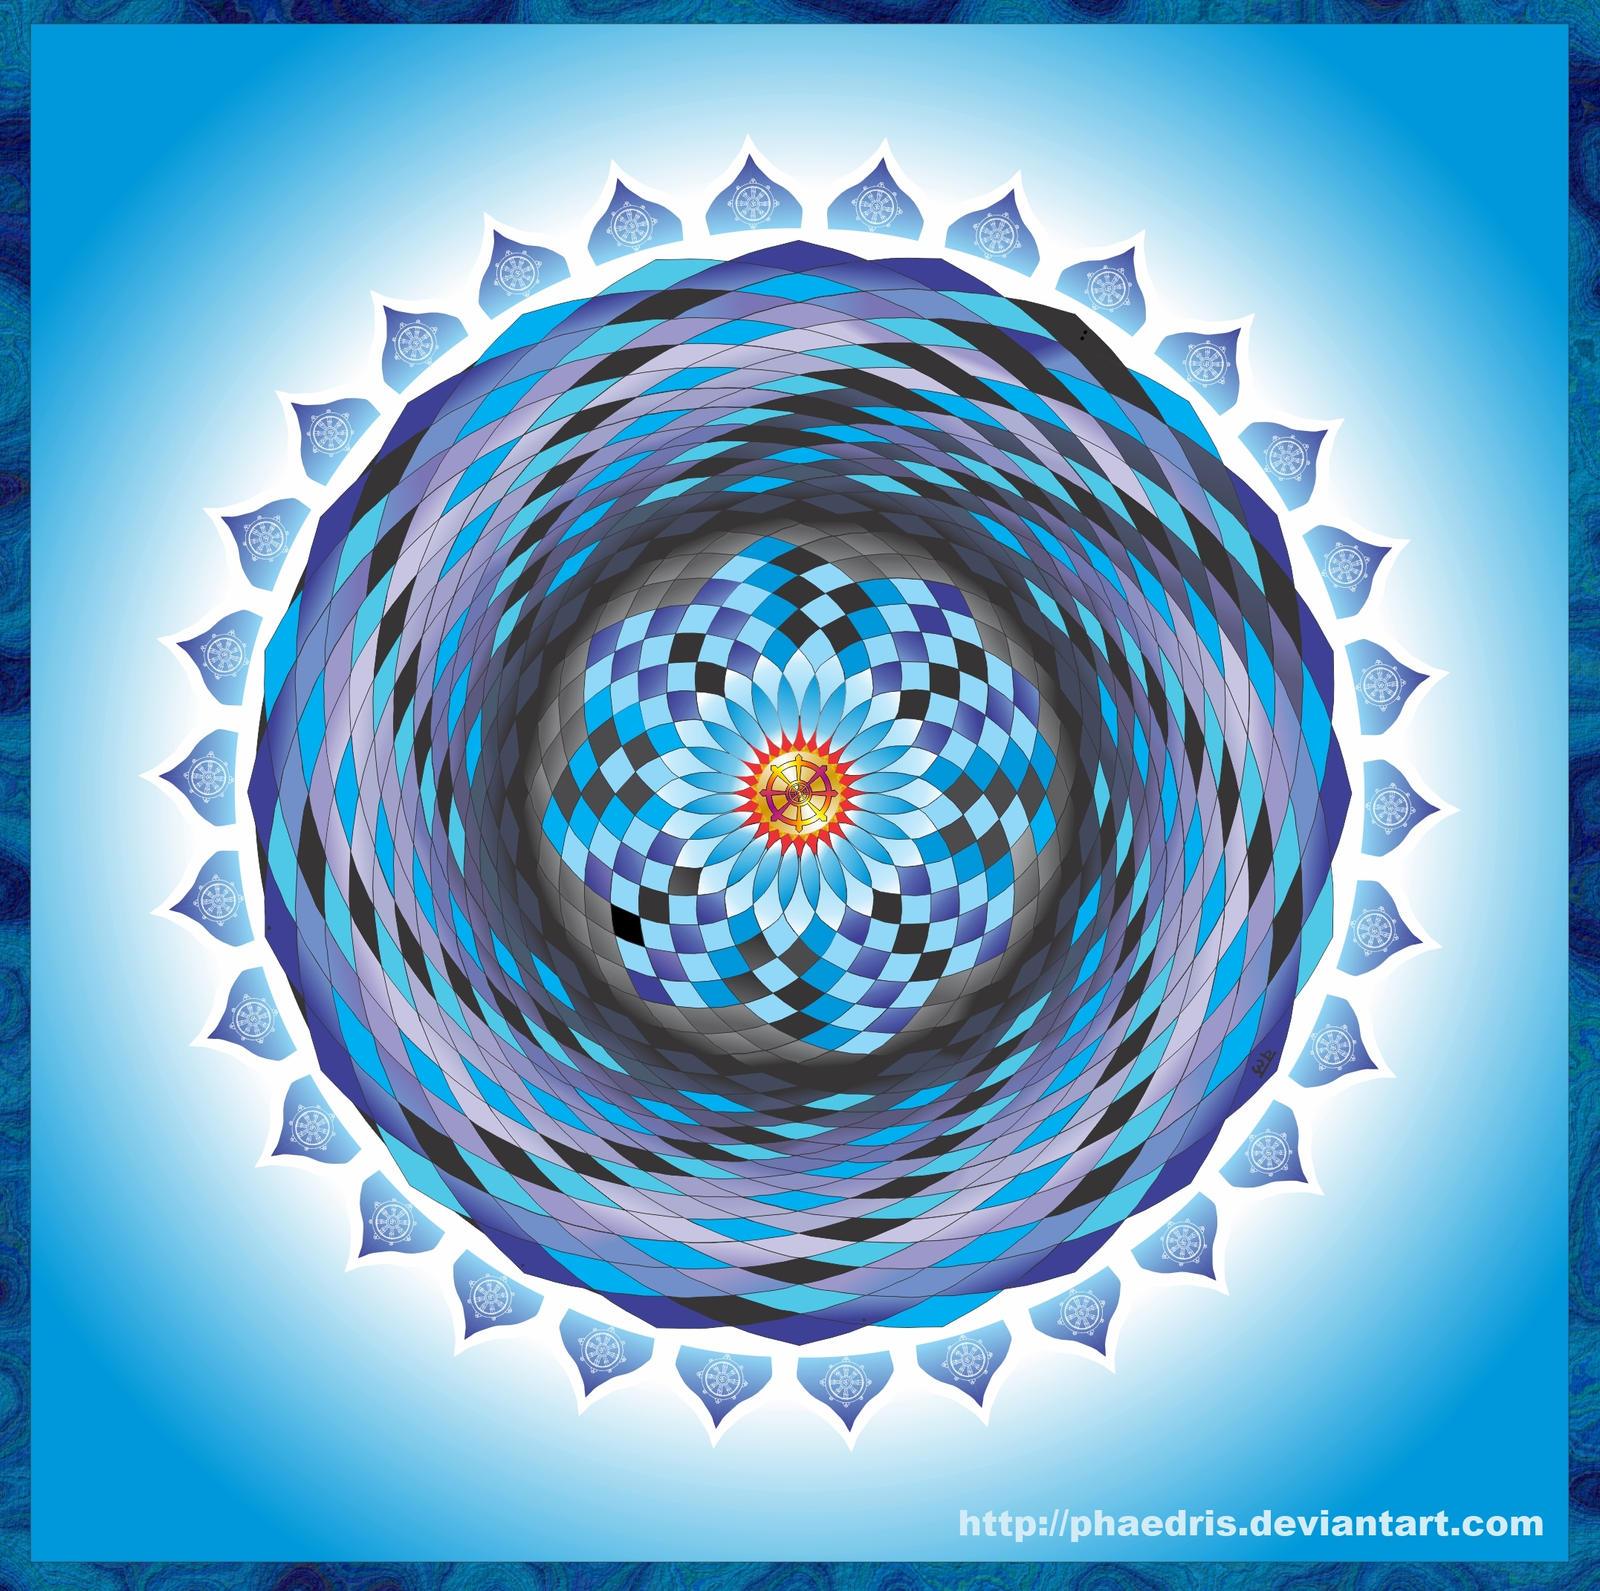 Dharma Wheel Mandala by Phaedris on DeviantArt